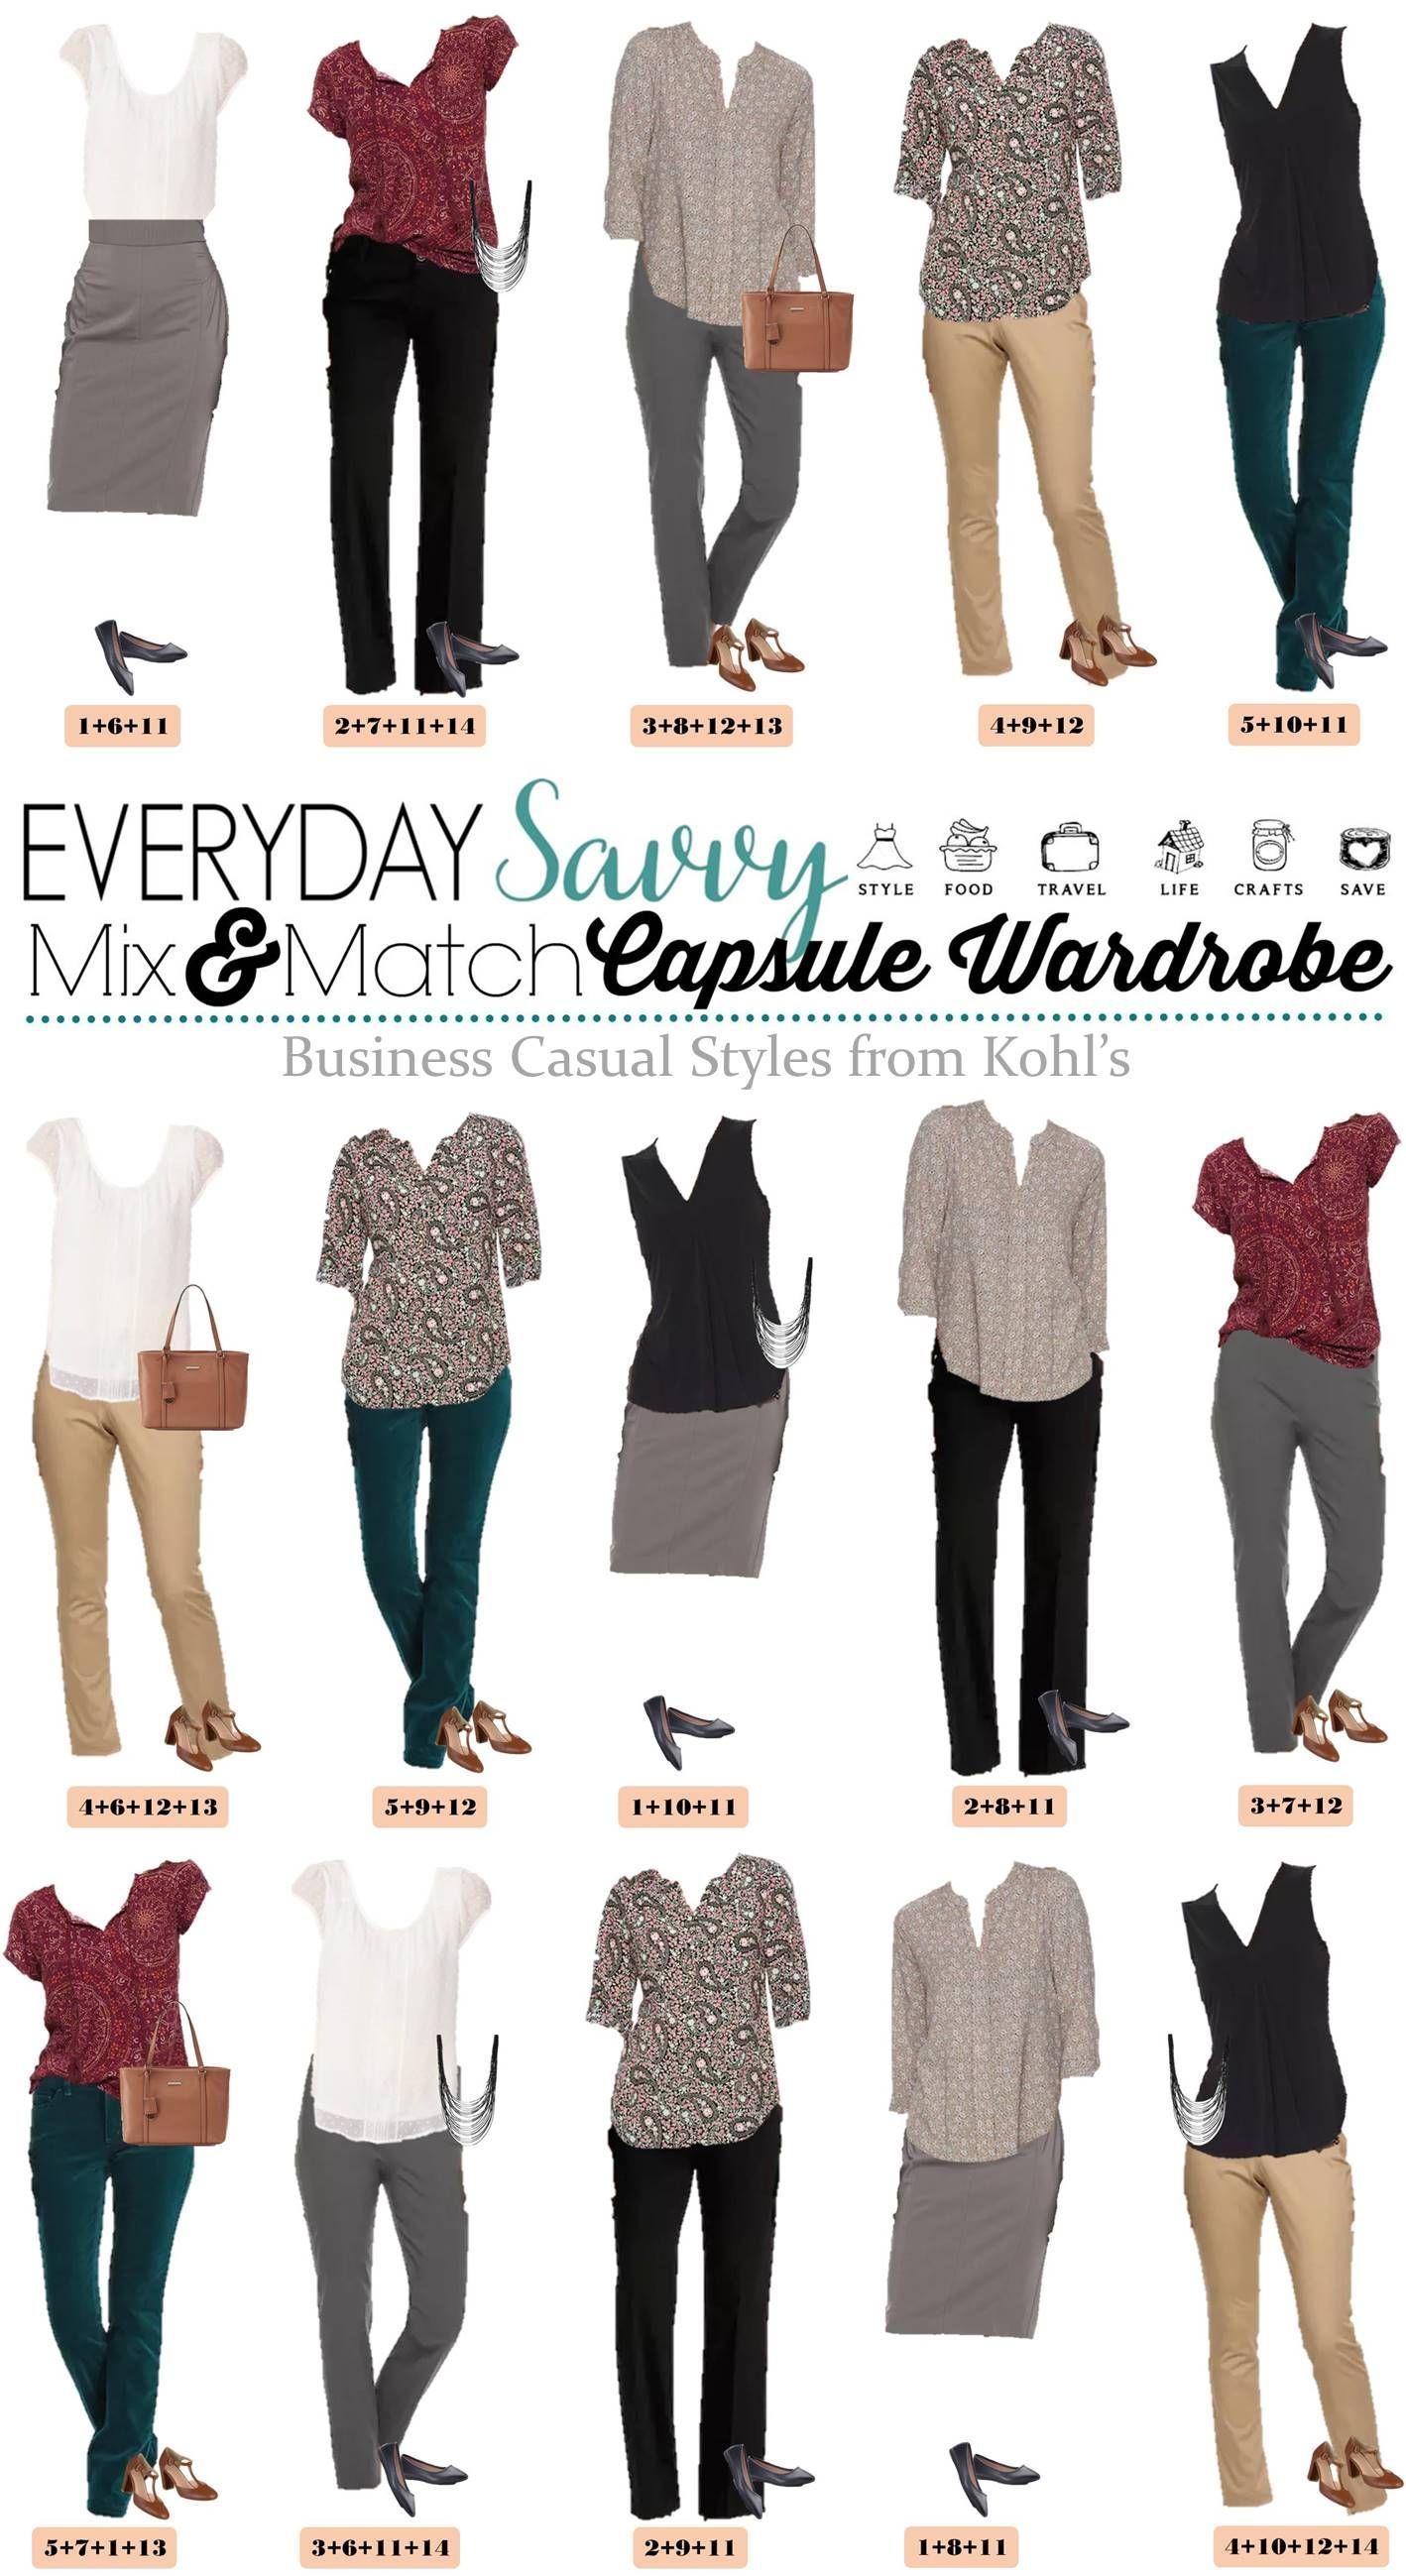 Kohls Business Casual Attire For Women Capsule Wardrobe